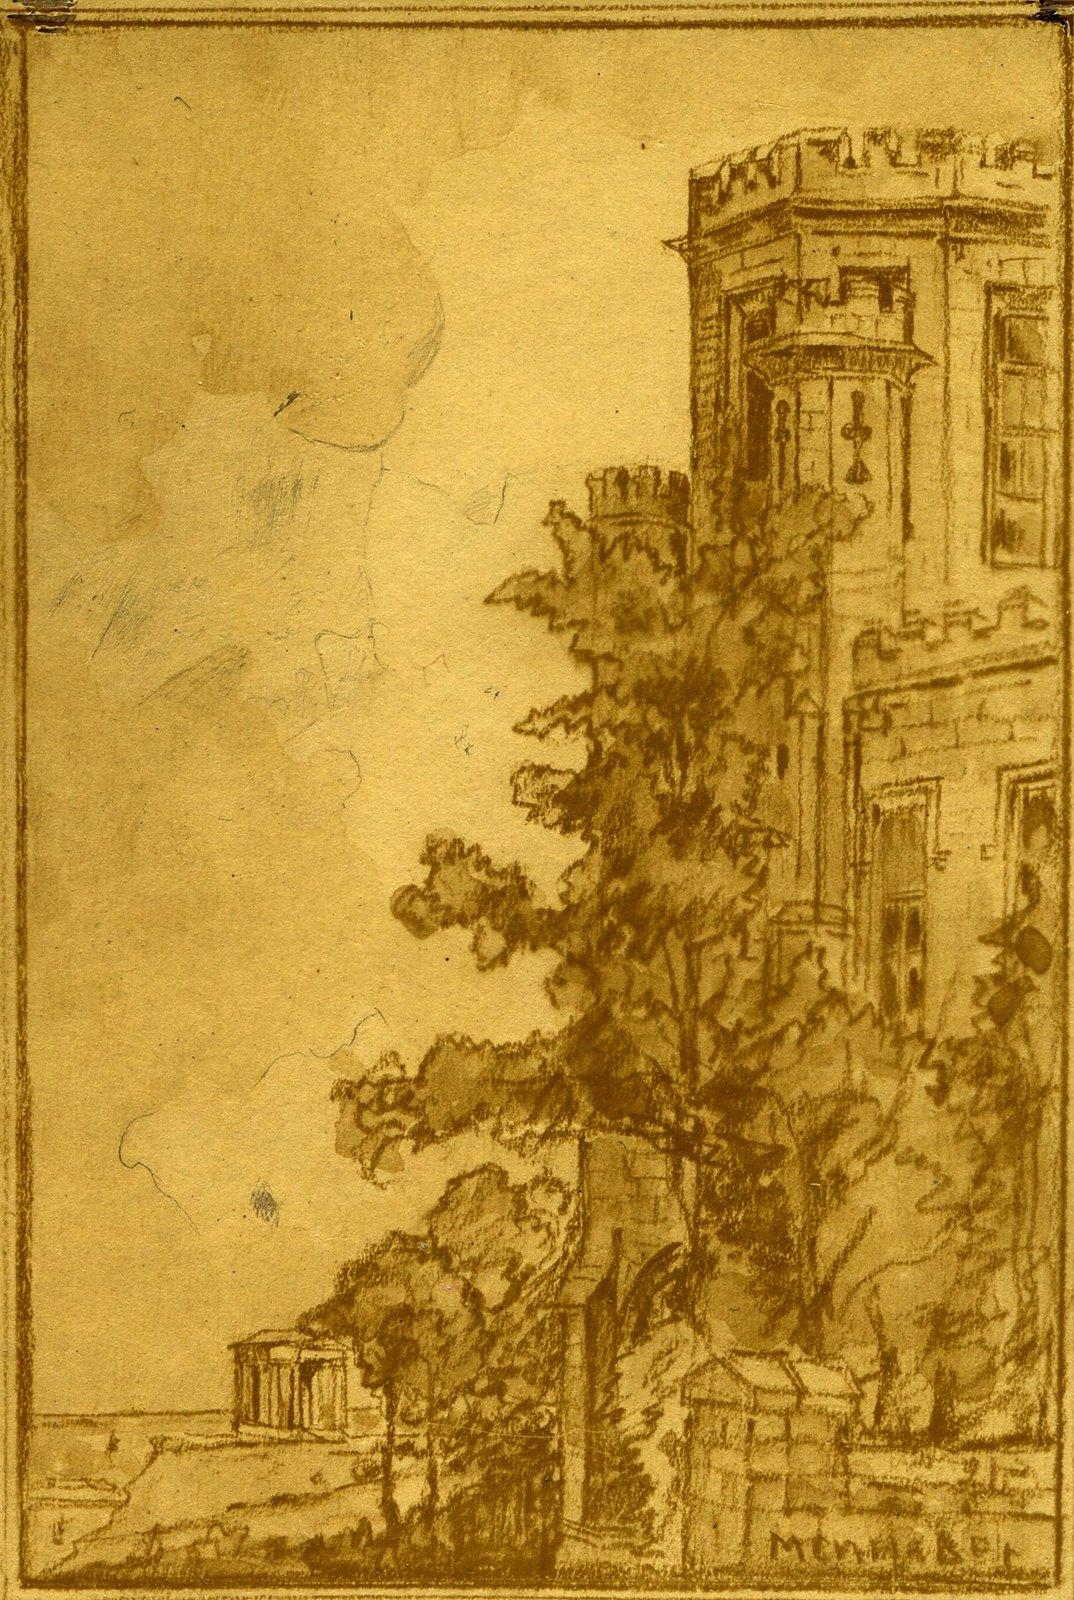 Деталь дворца персидского шаха.